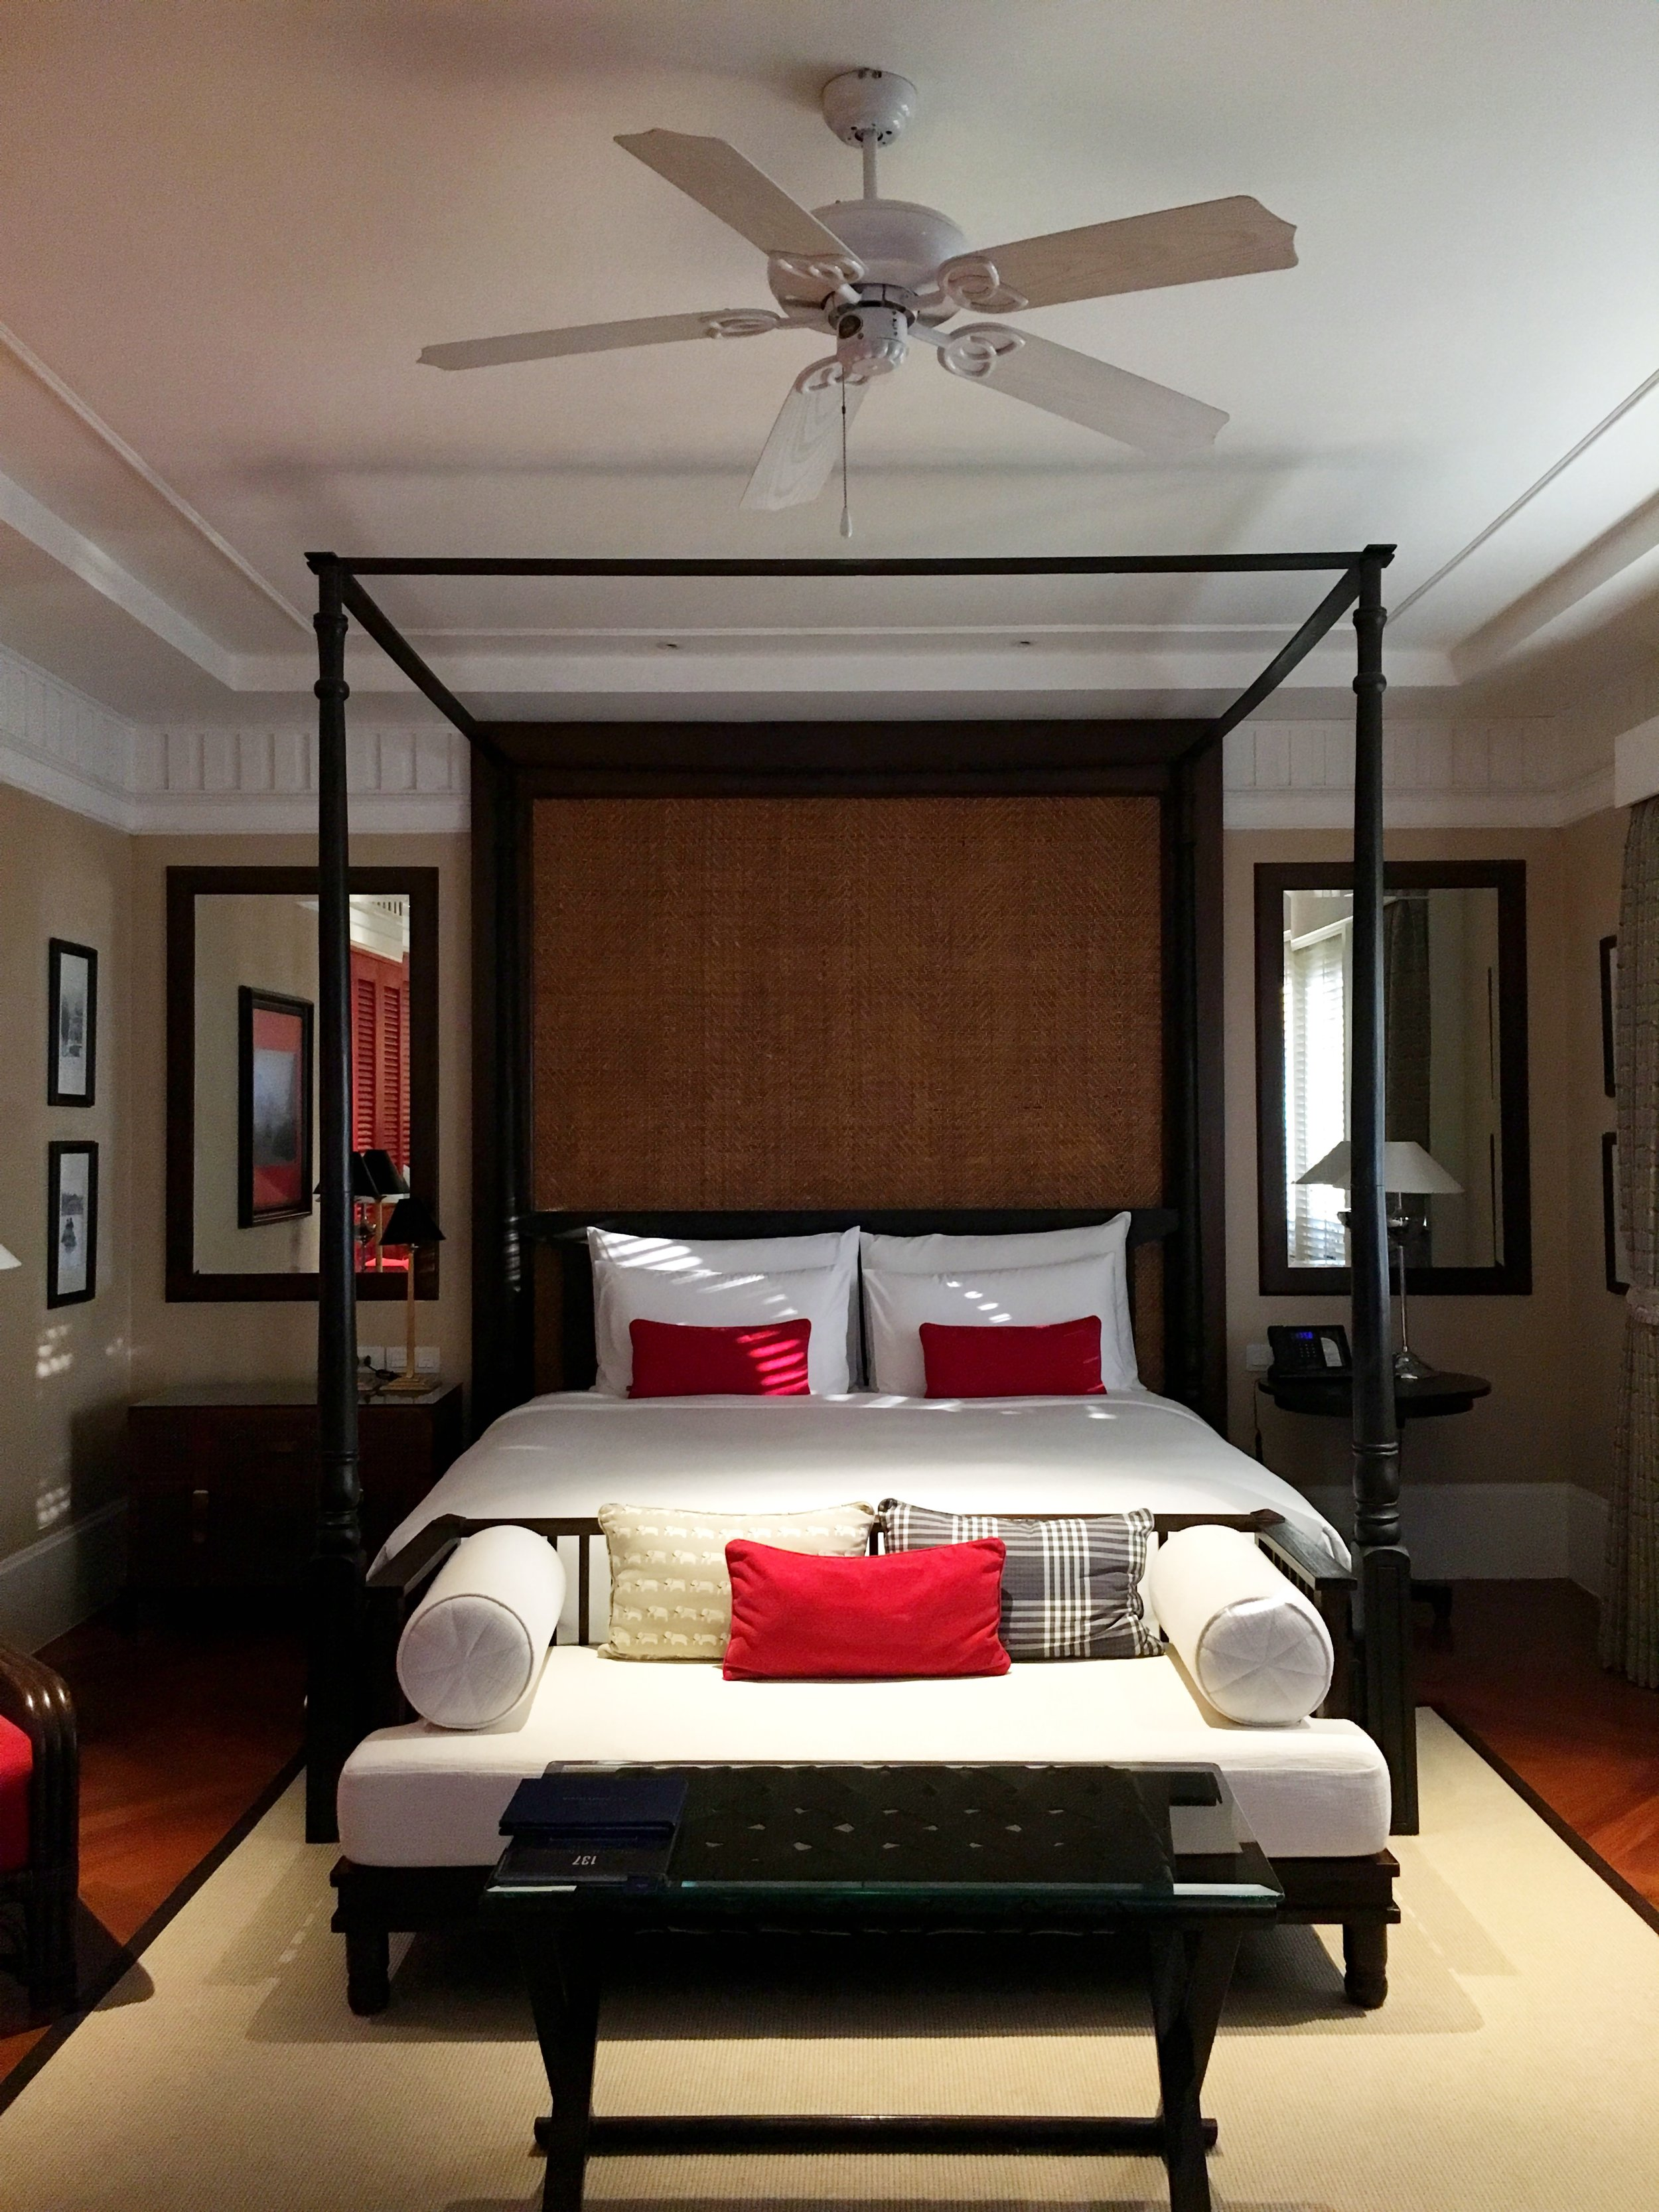 The Leonowens Suite's bedroom